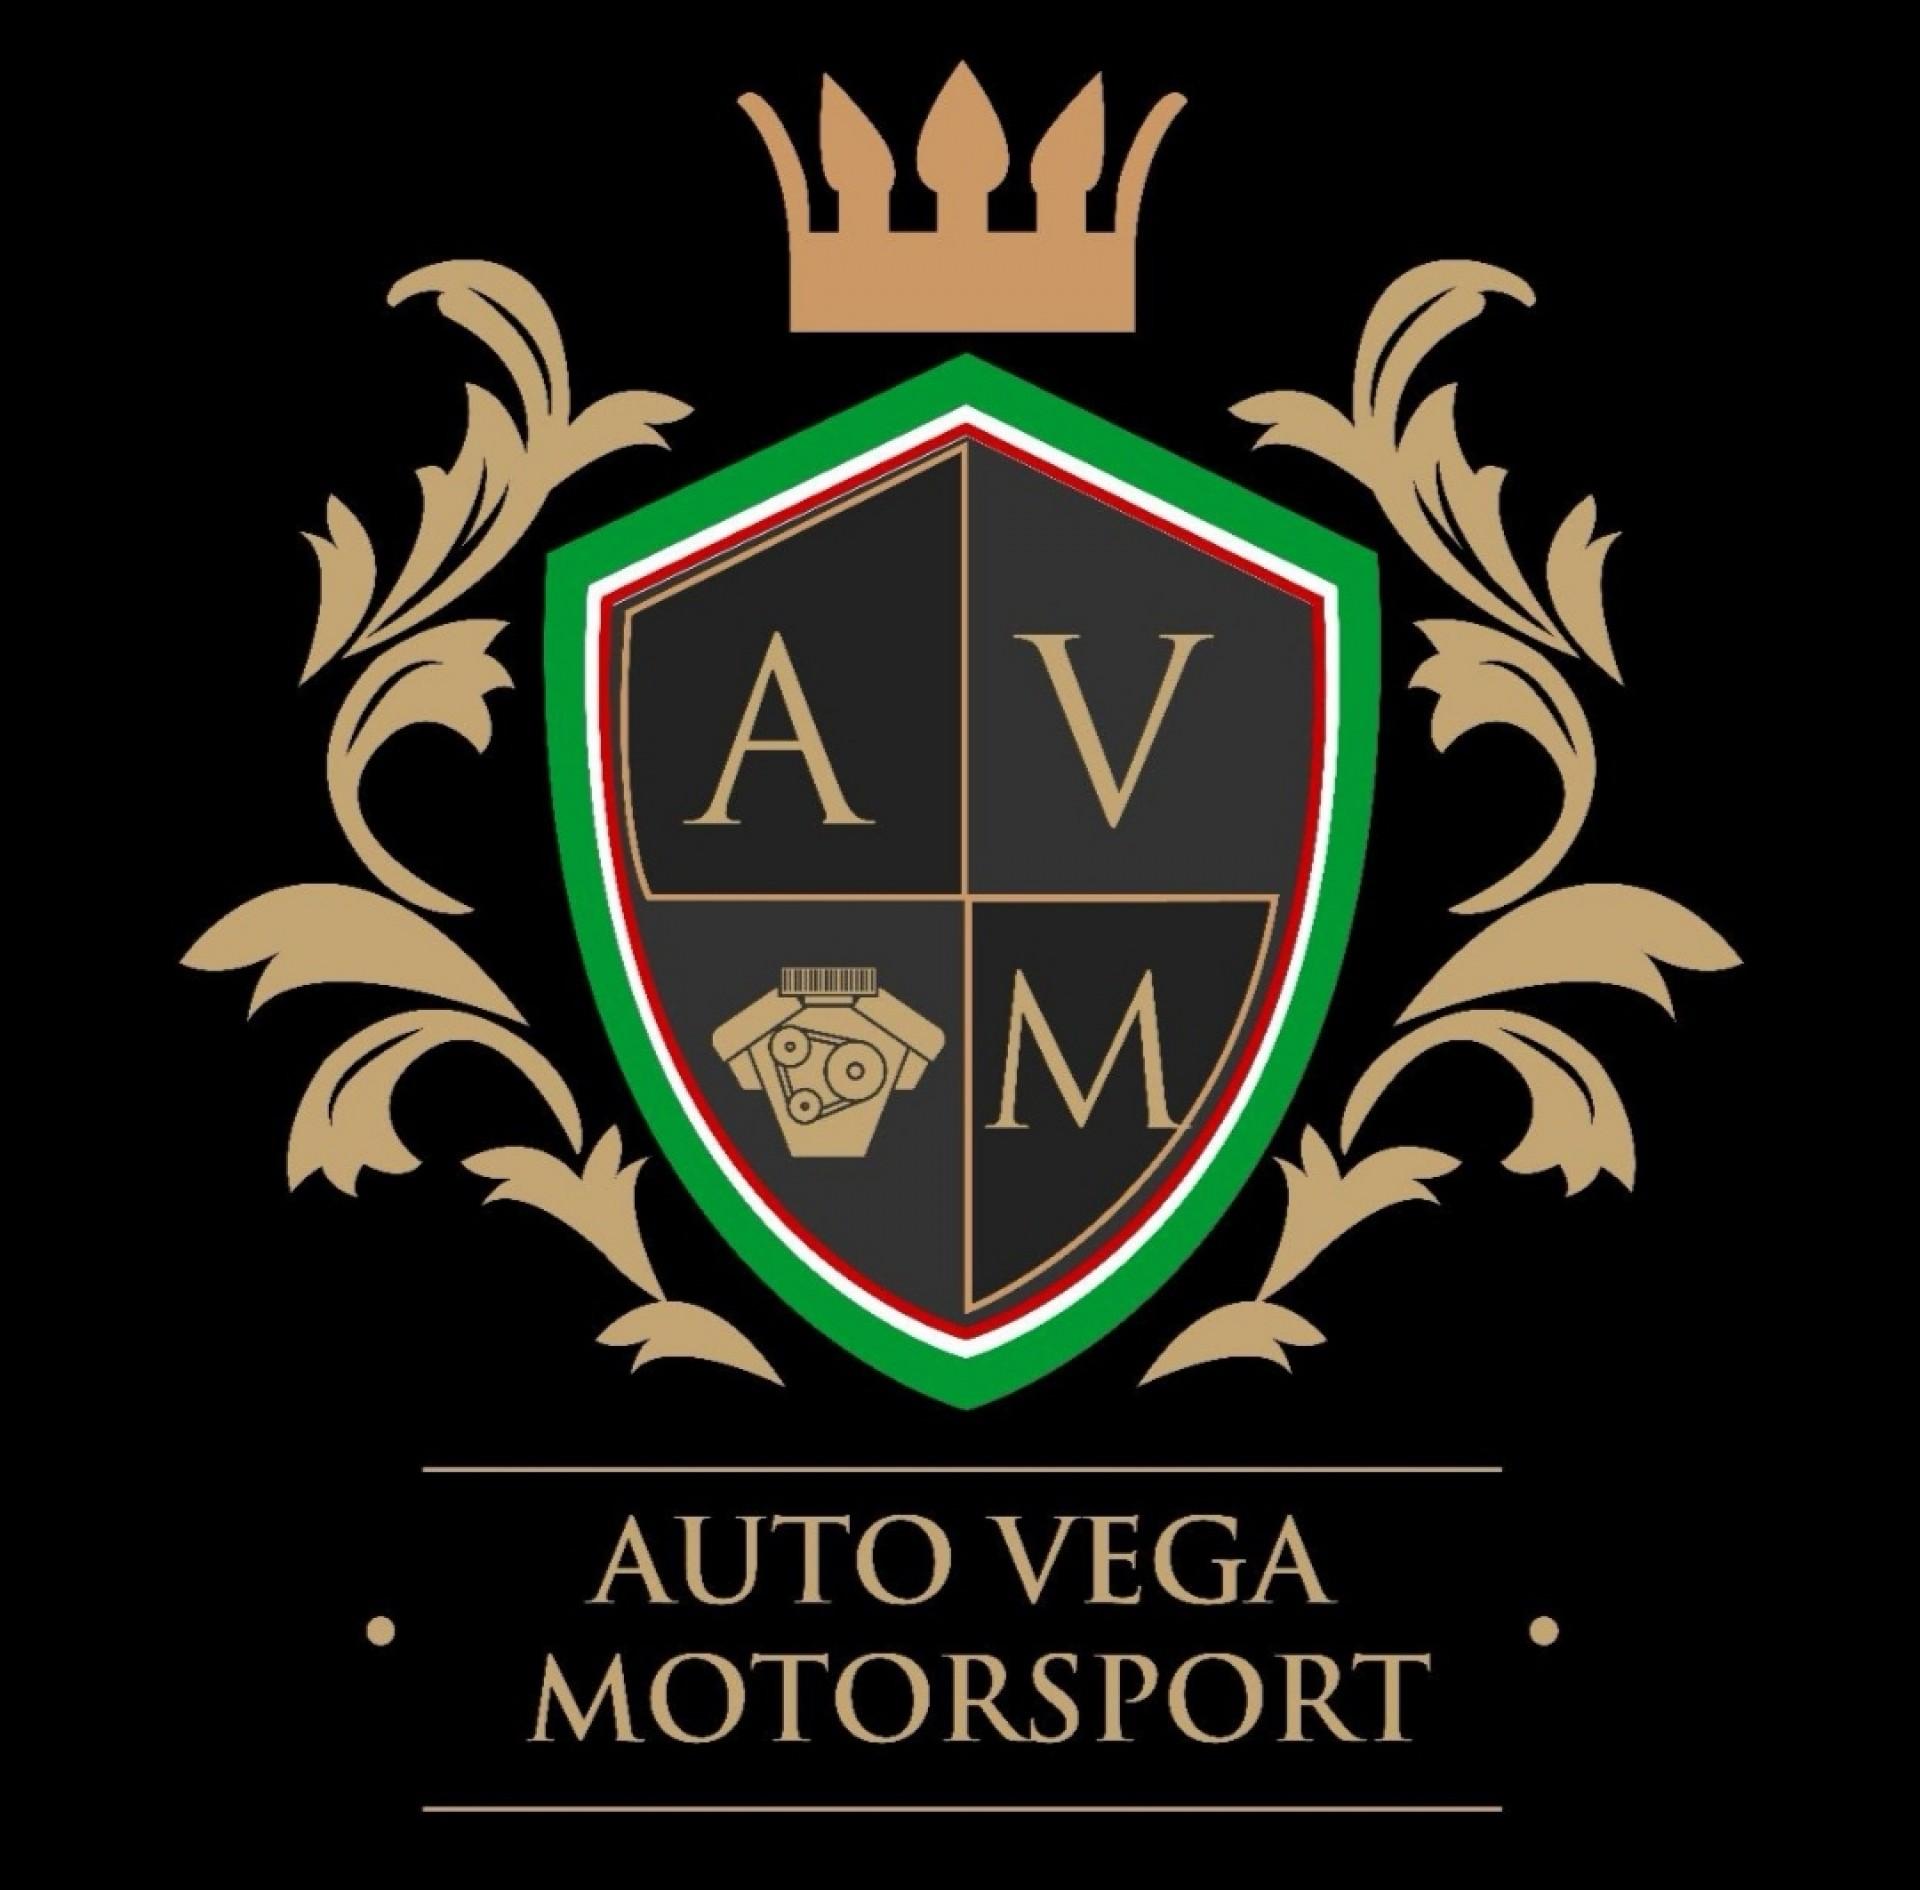 Autovegamotorsport logo